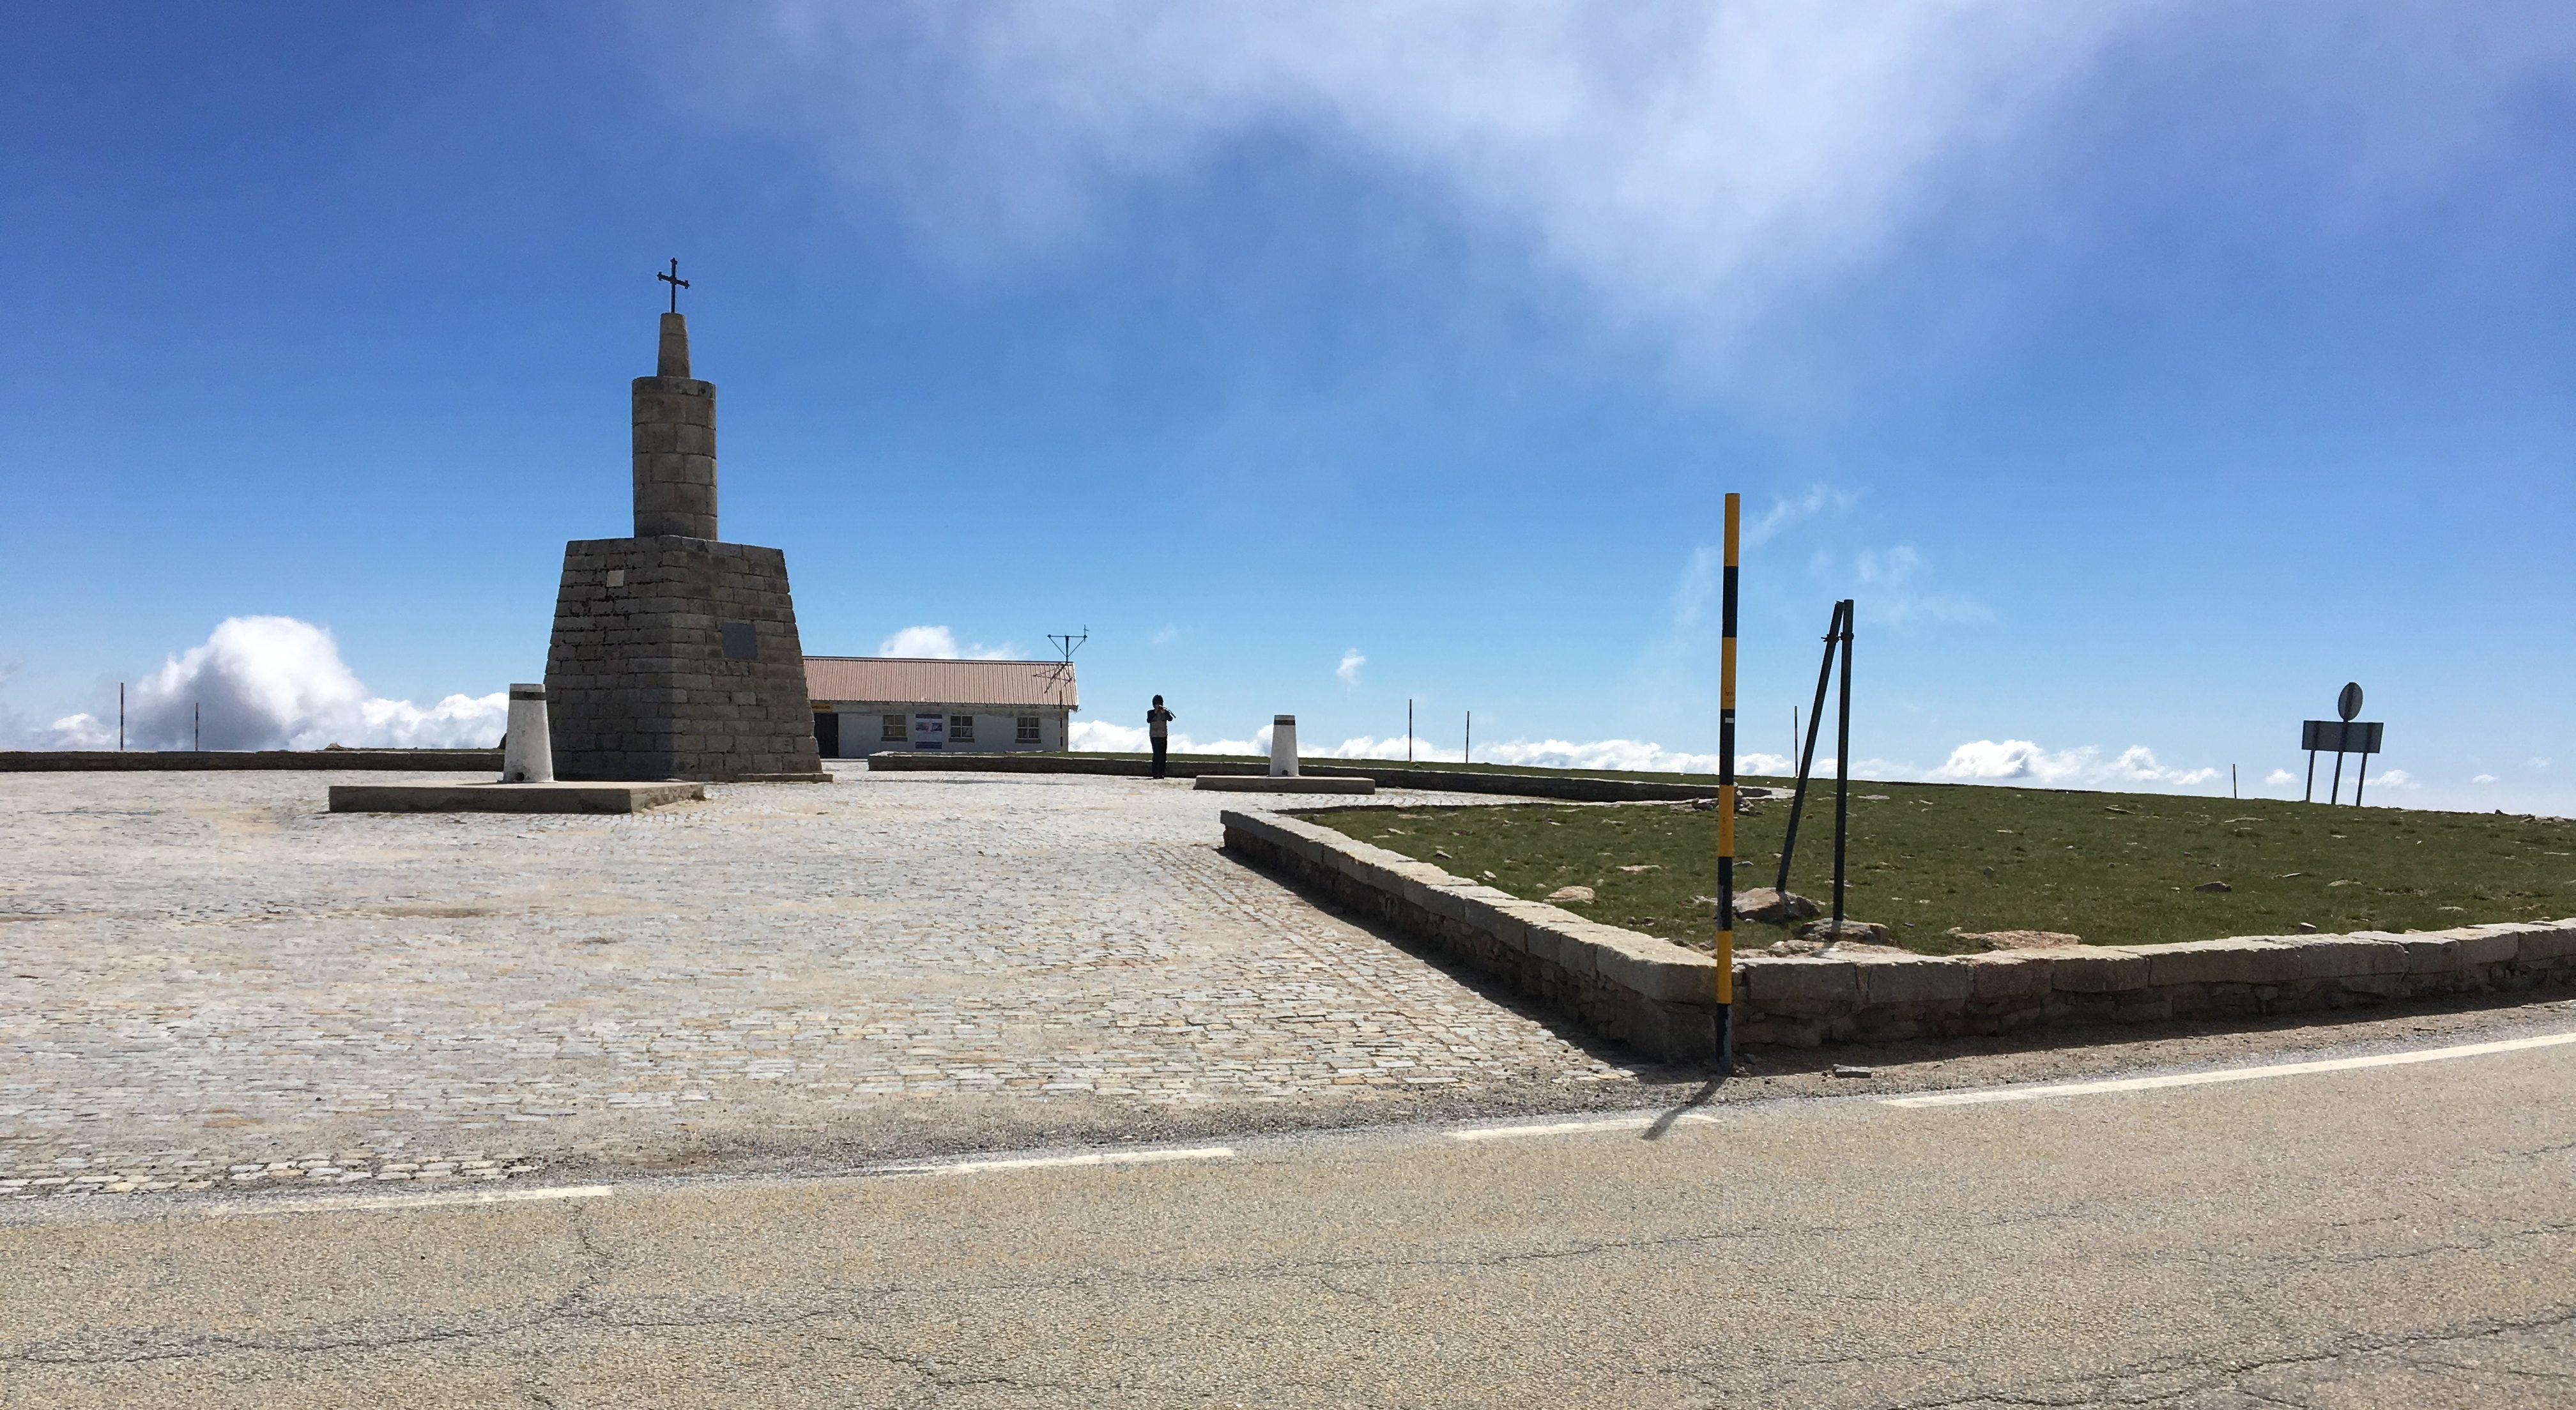 Wolken kratzen am Torre in der Serra da Estrela